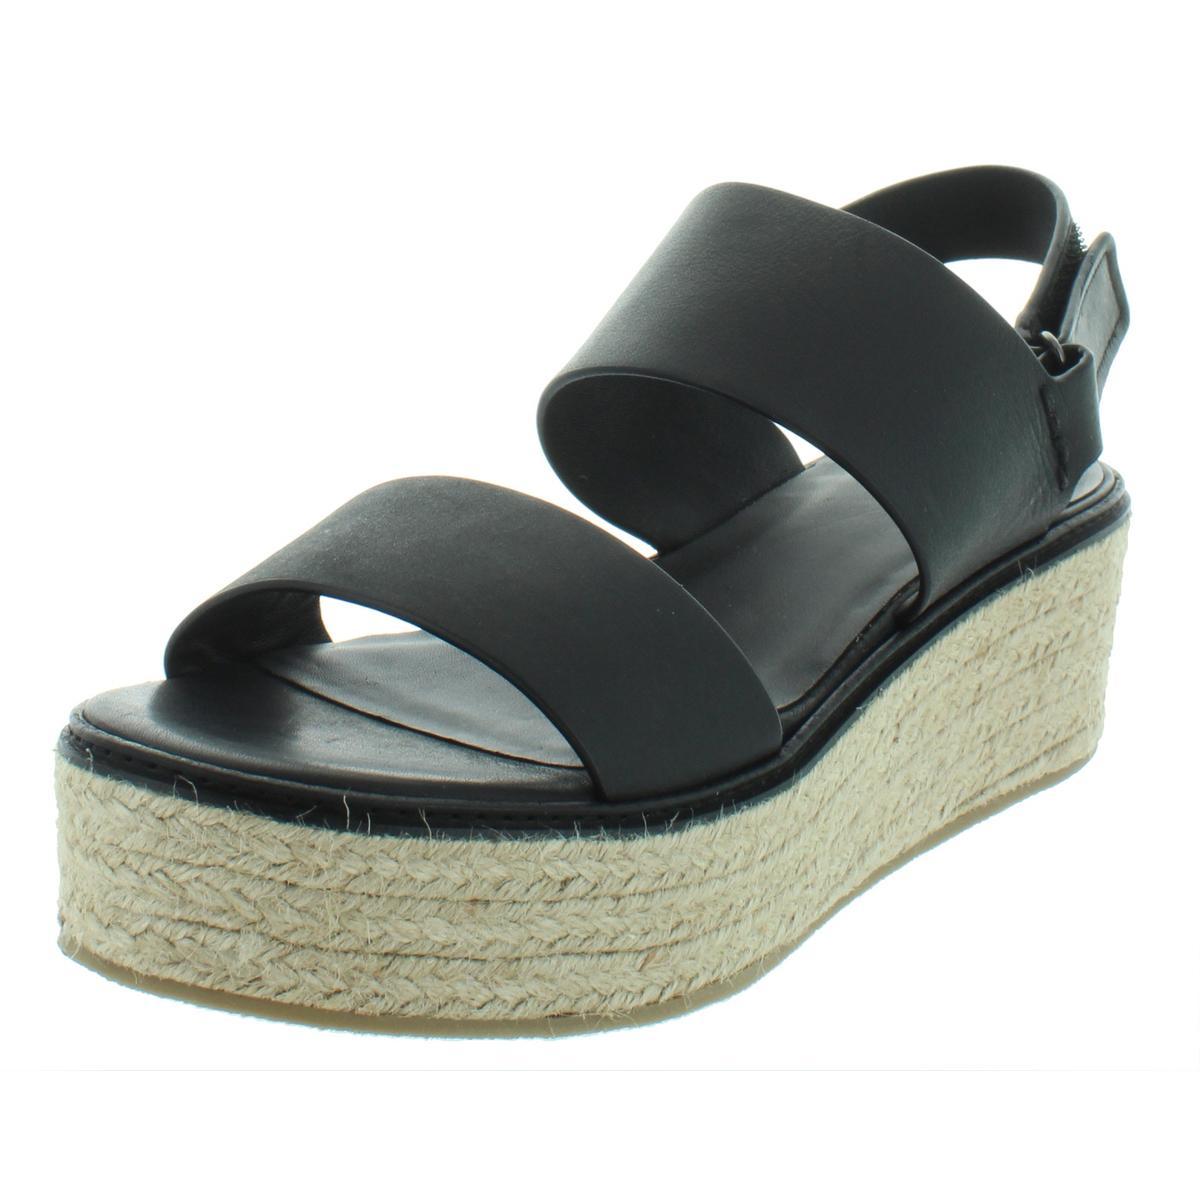 91204ee290 Details about Vince Womens Janet Black High Platform Sandals Shoes 9 Medium  (B,M) BHFO 2755